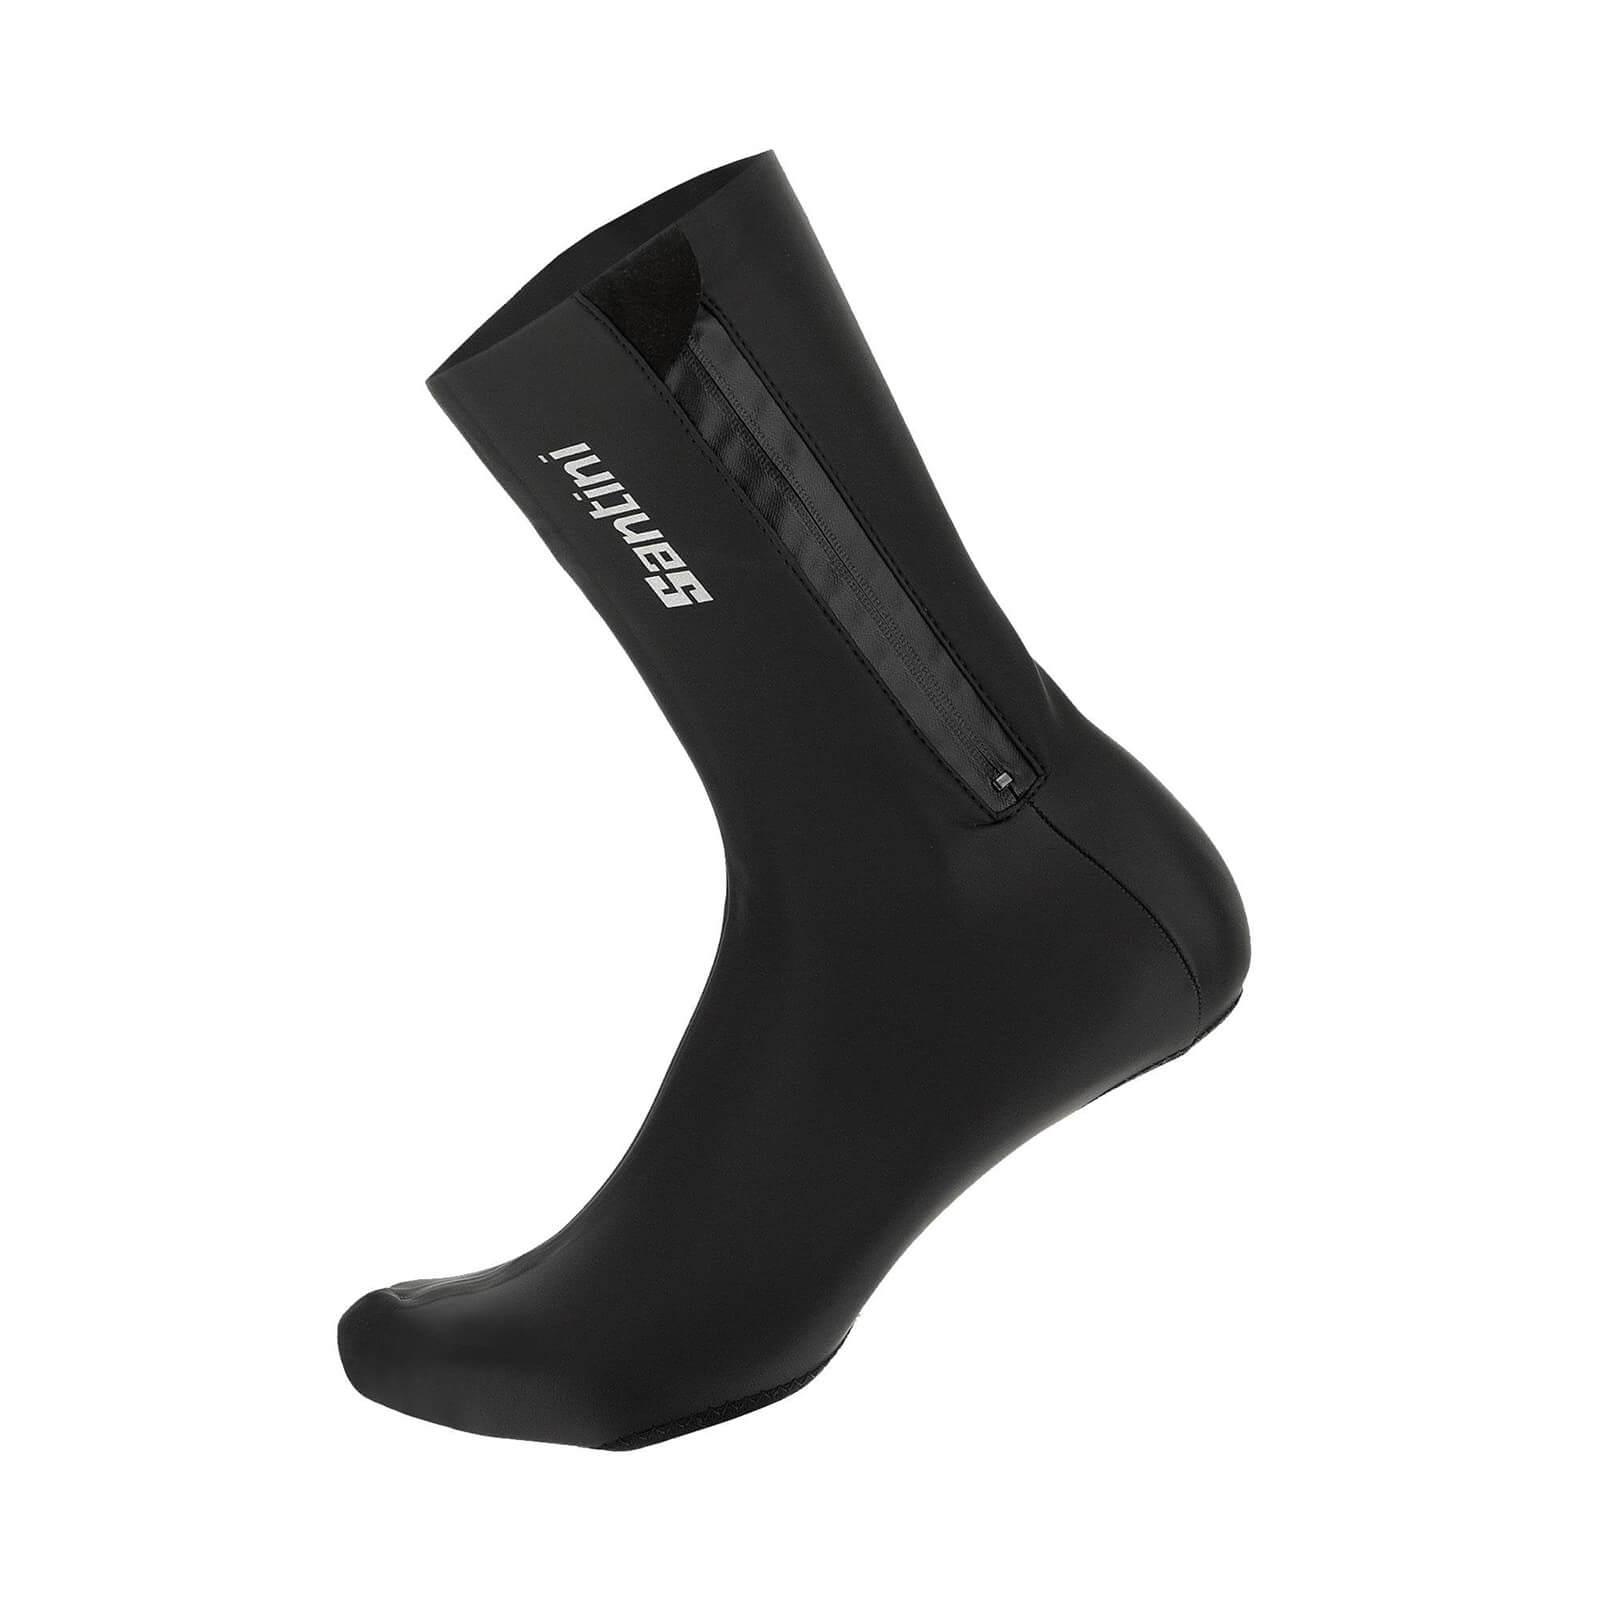 Santini Weatherproof Performance Overshoes - Black - XL